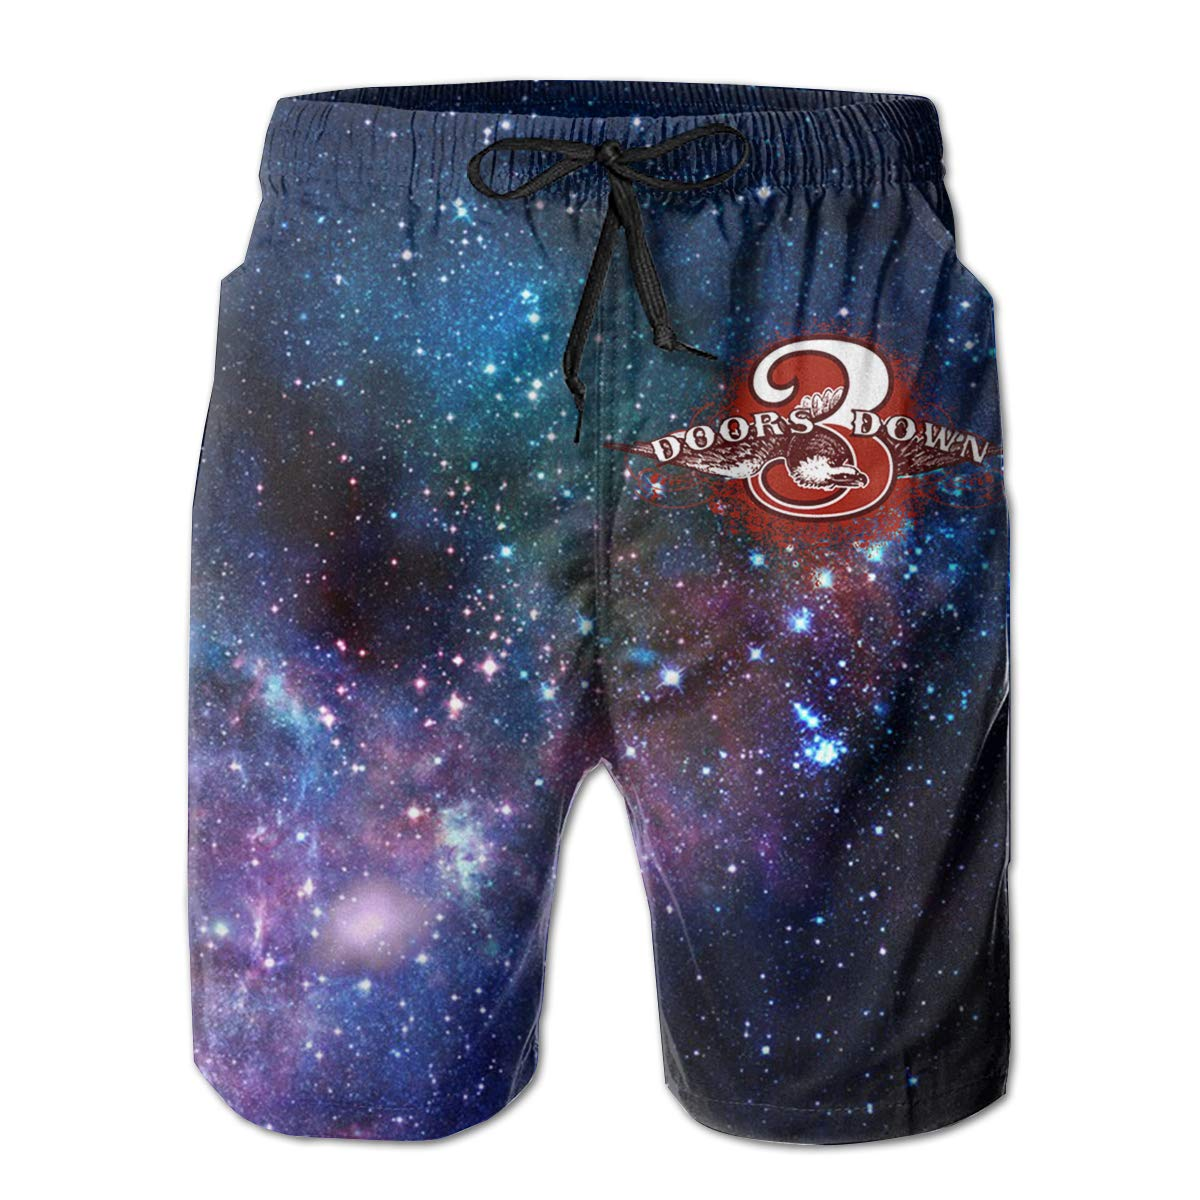 Mens 3 Doors Down Music Band Casual Beach Board Shorts Quick-Drying Drawstring Swim Trunks